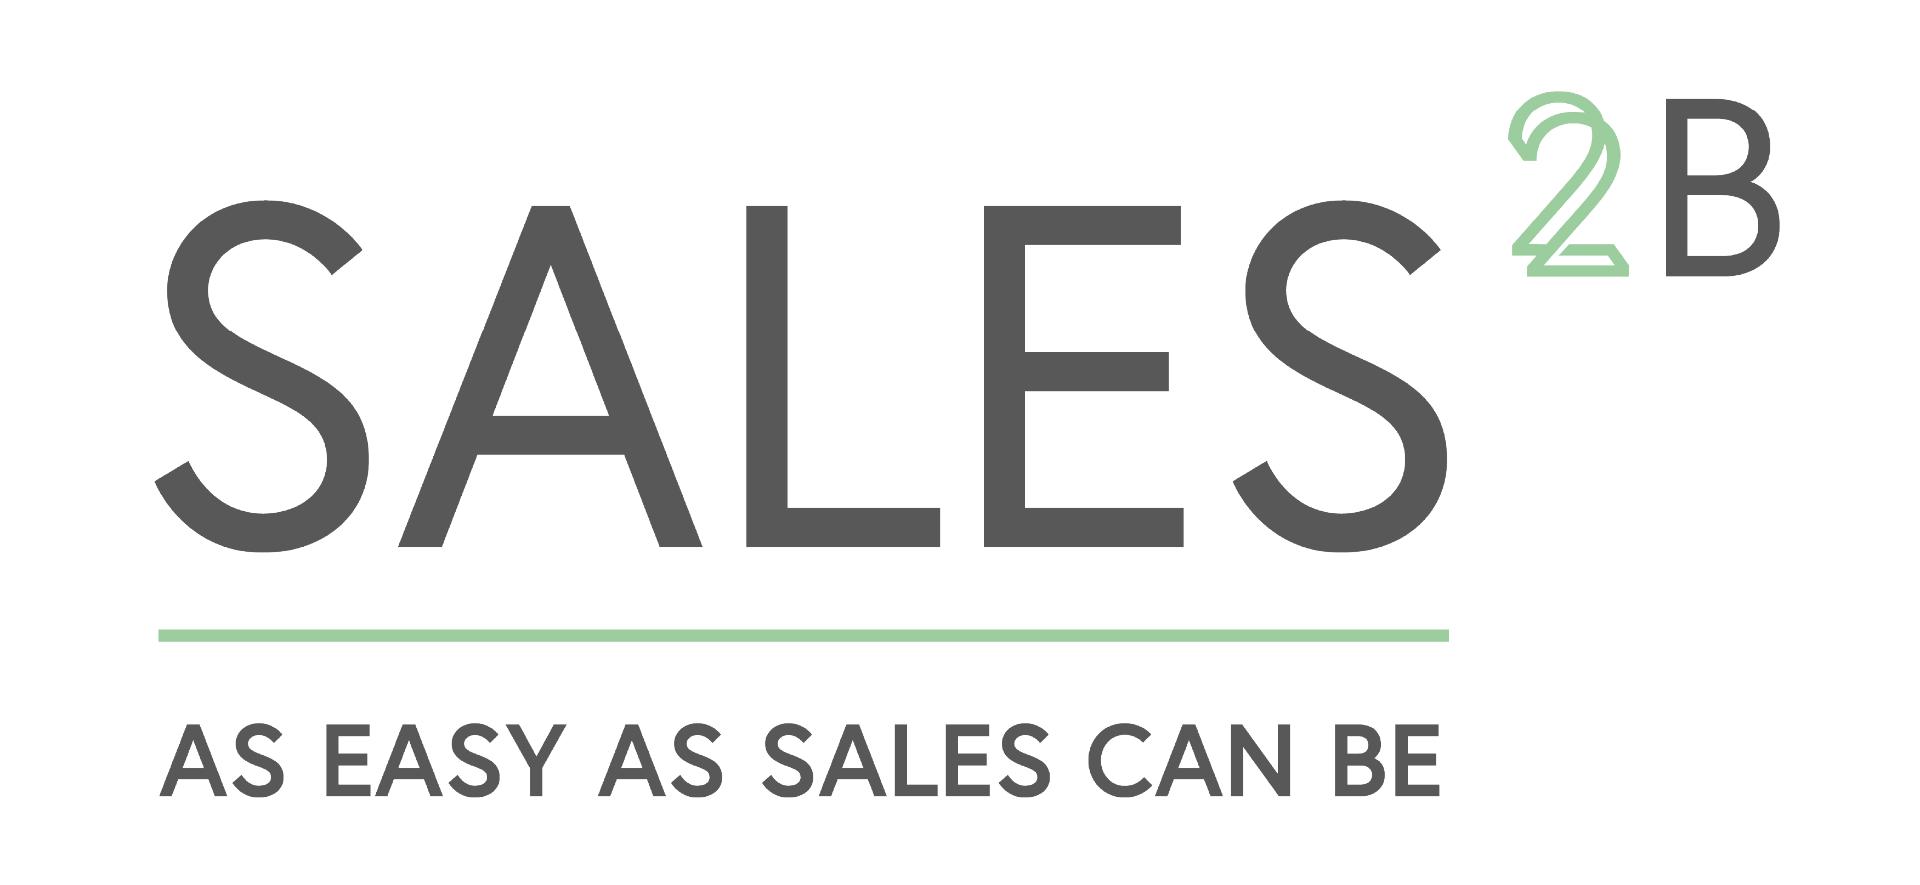 SALES2B Logo weiß